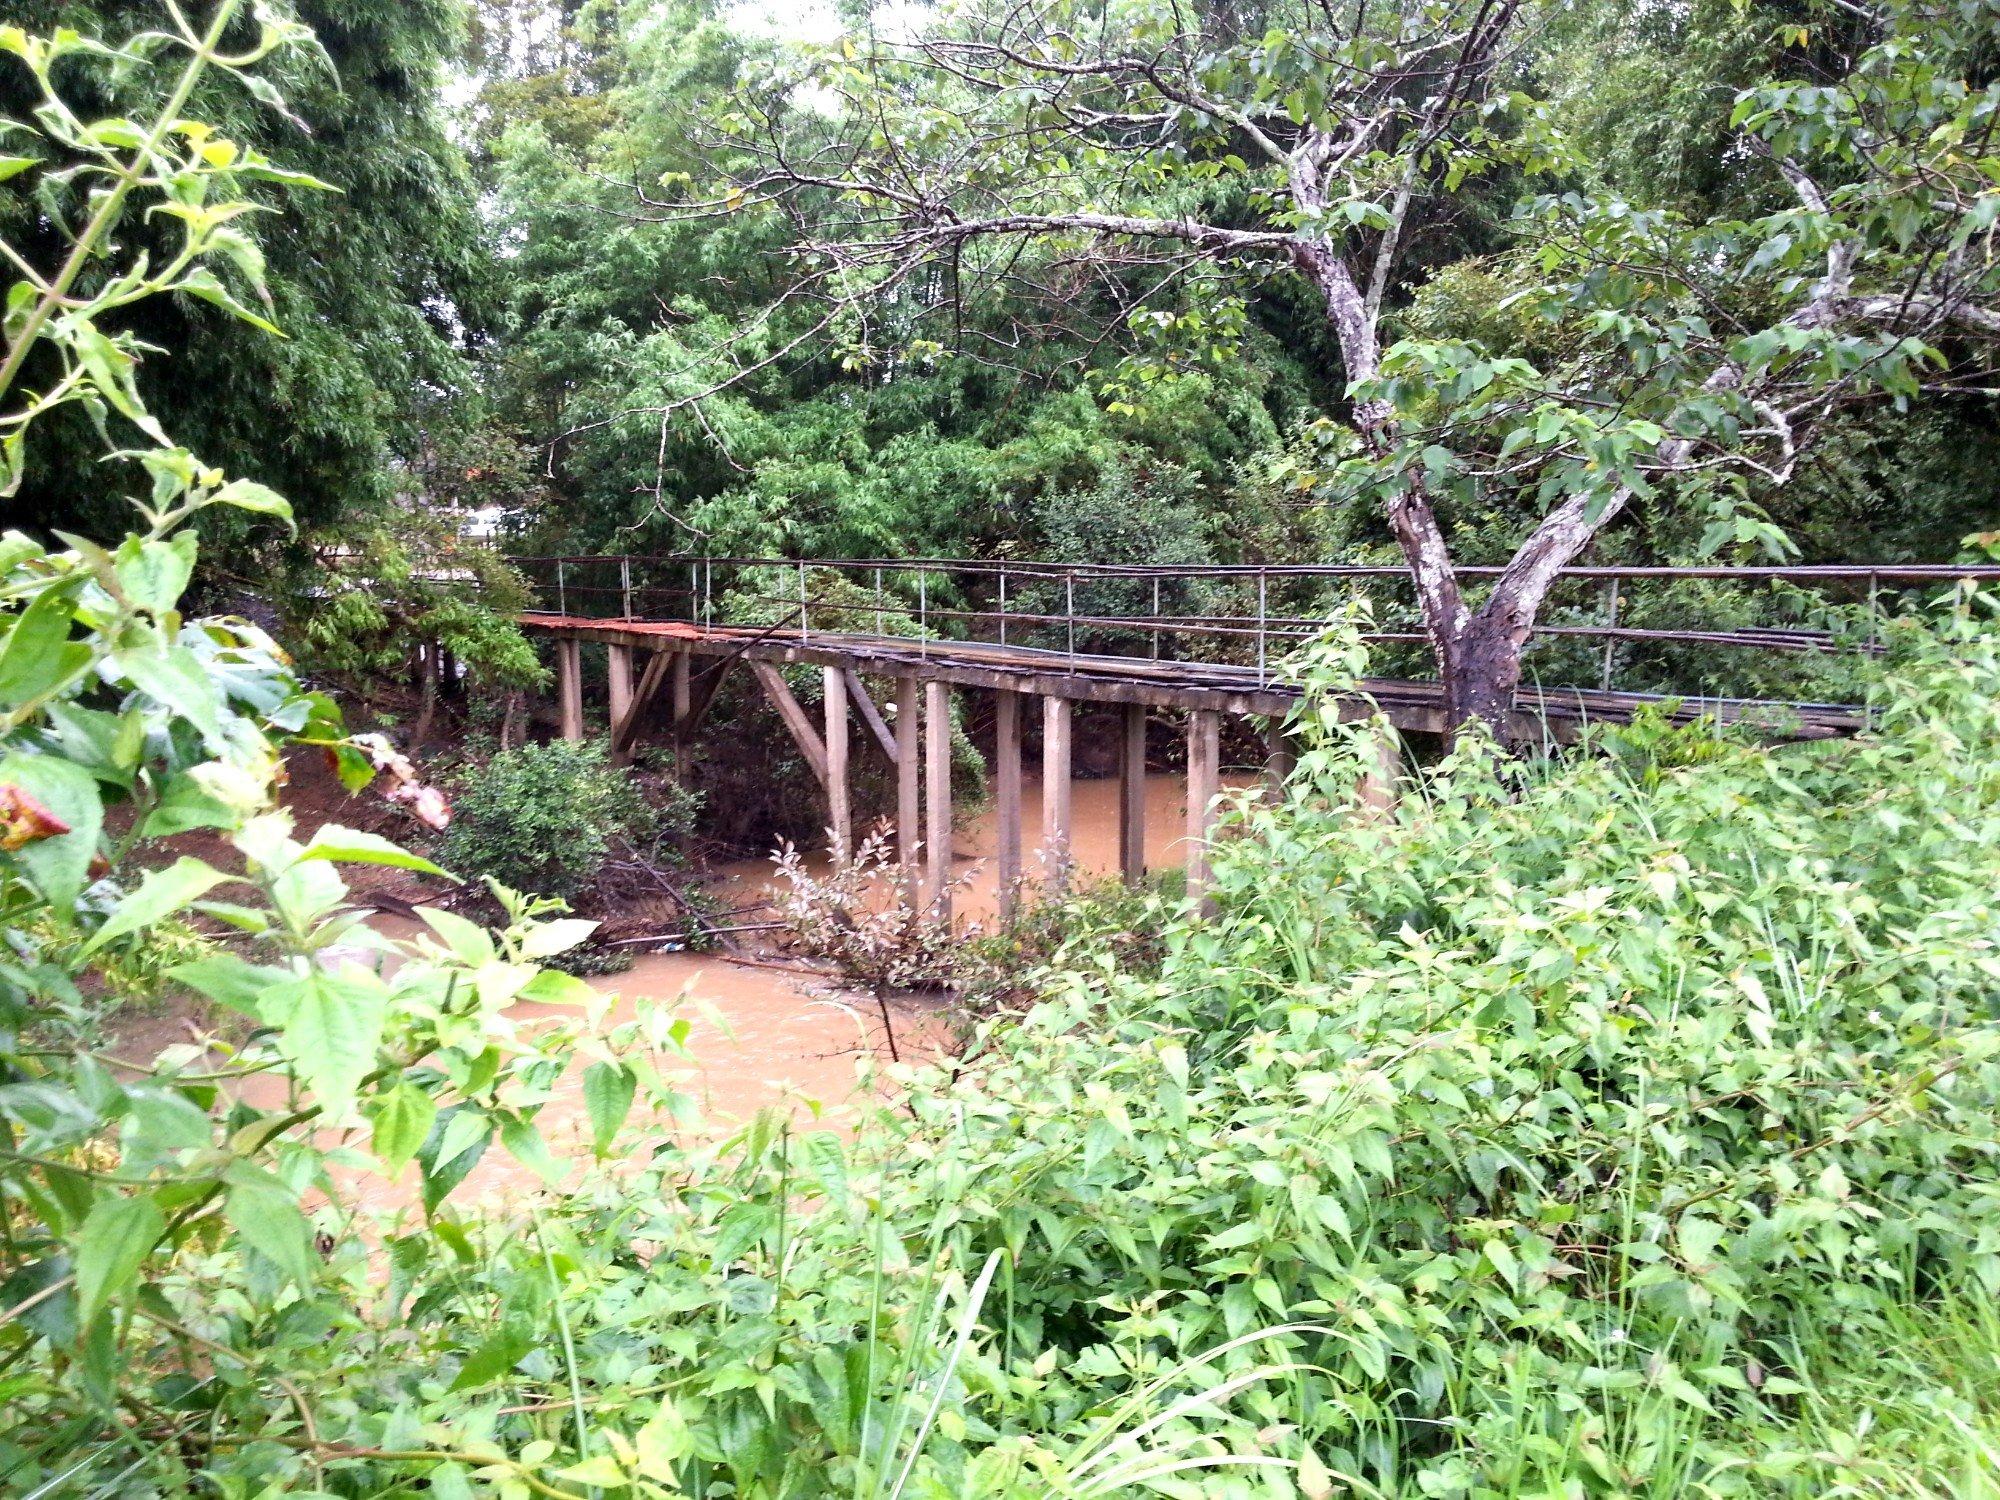 Bridge to cross on the way to Jar Site 3